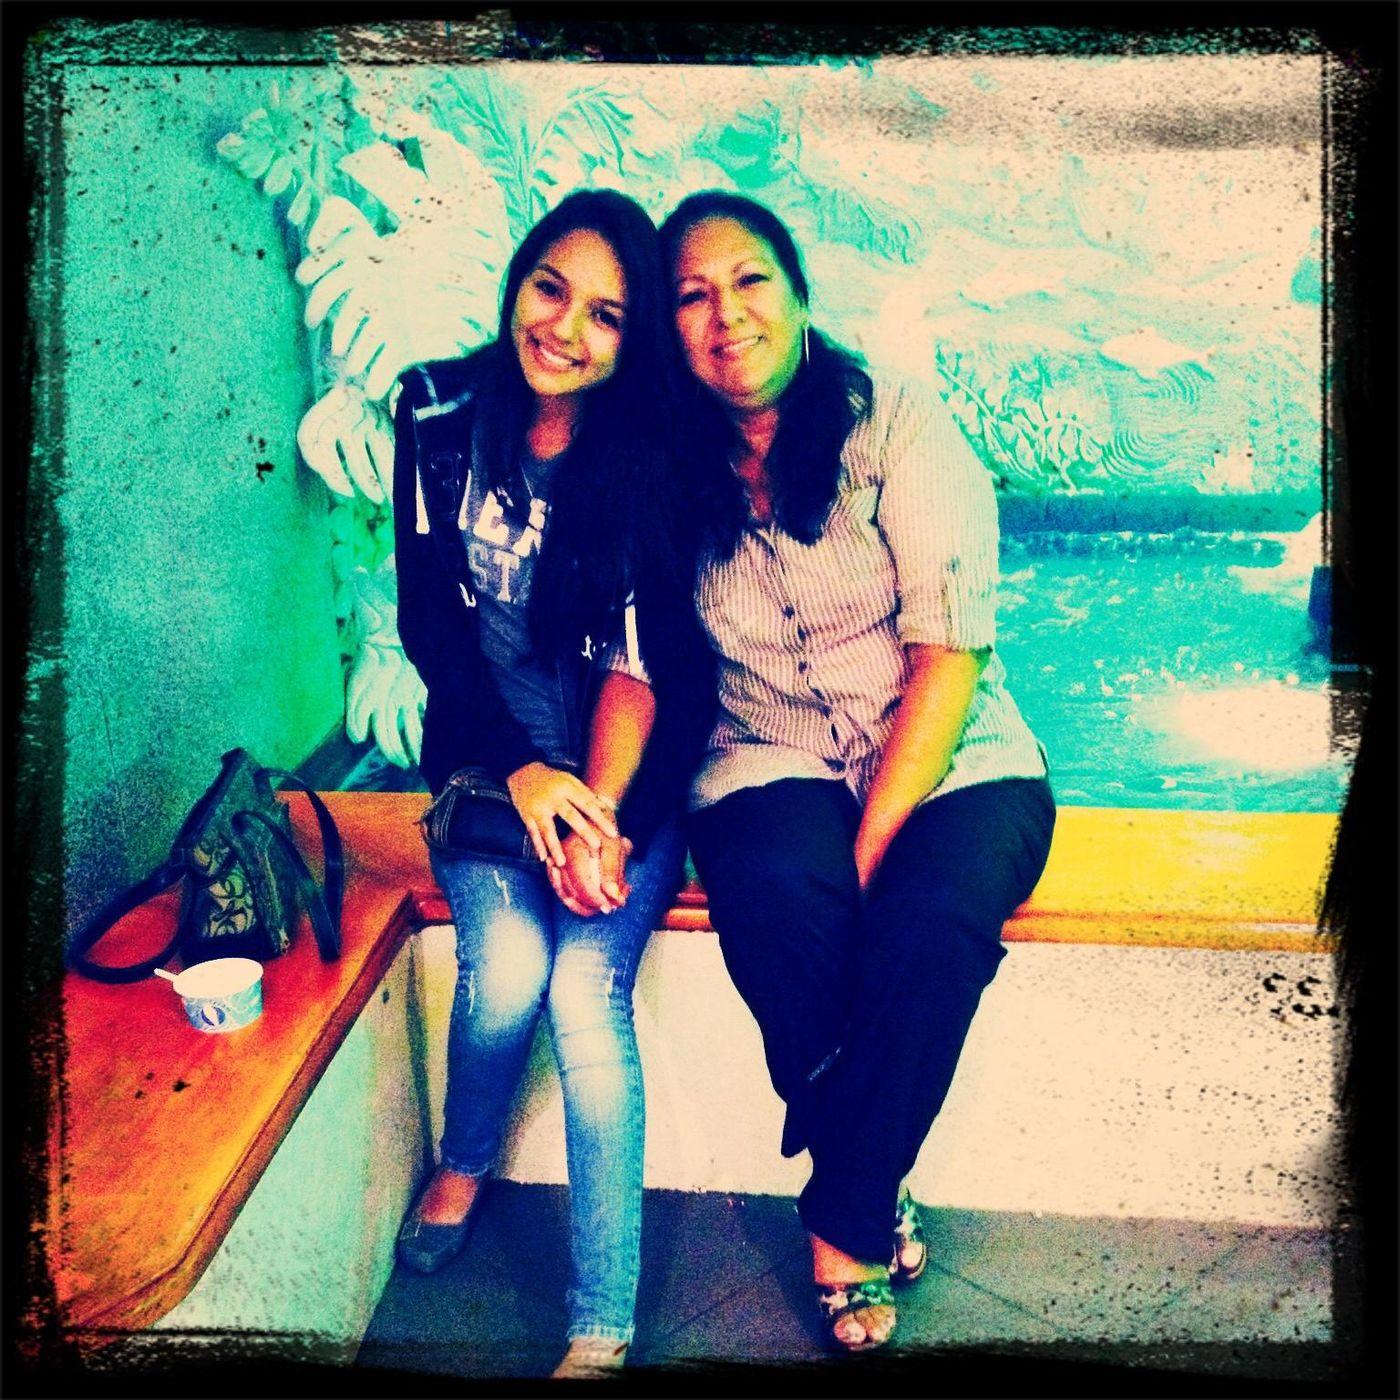 I love you mom ❤️